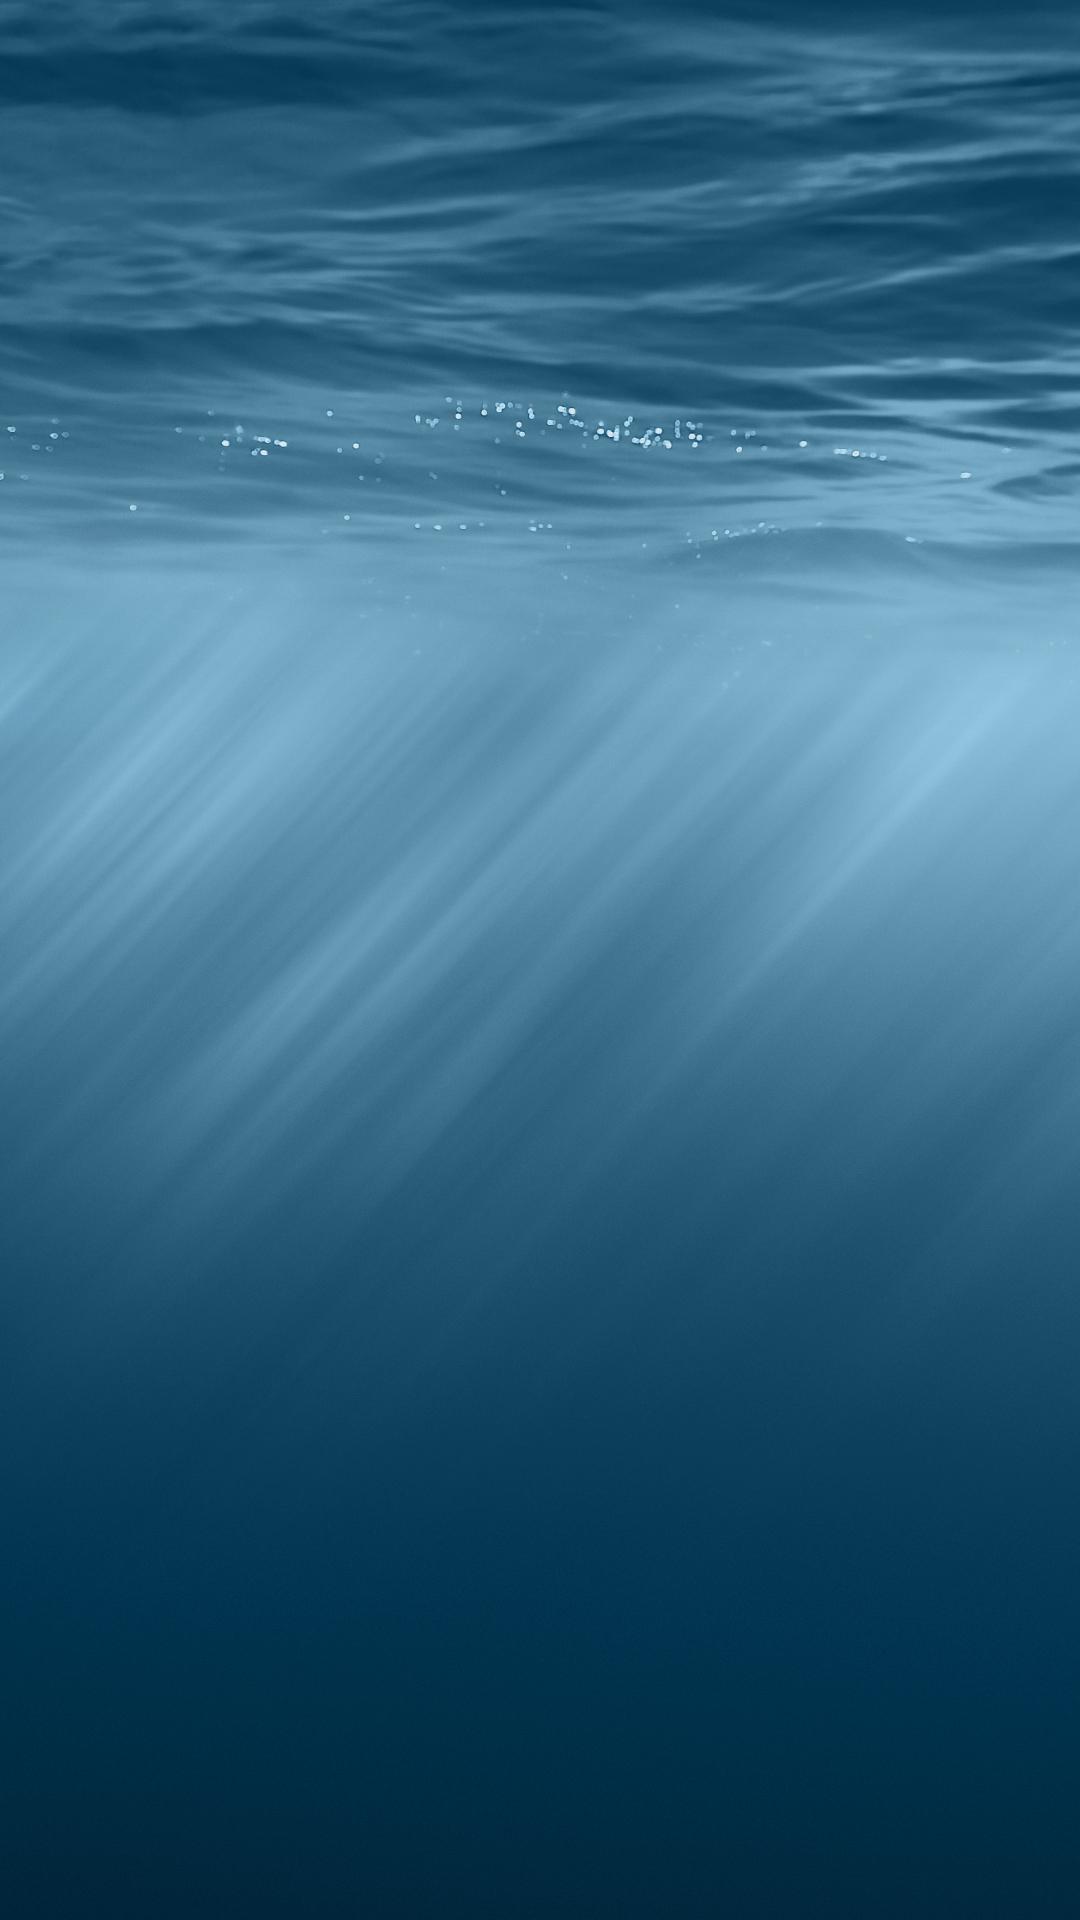 Apple iOS 8 Underwater iPhone 6 Plus HD Wallpaper iPod Wallpaper HD 1080x1920